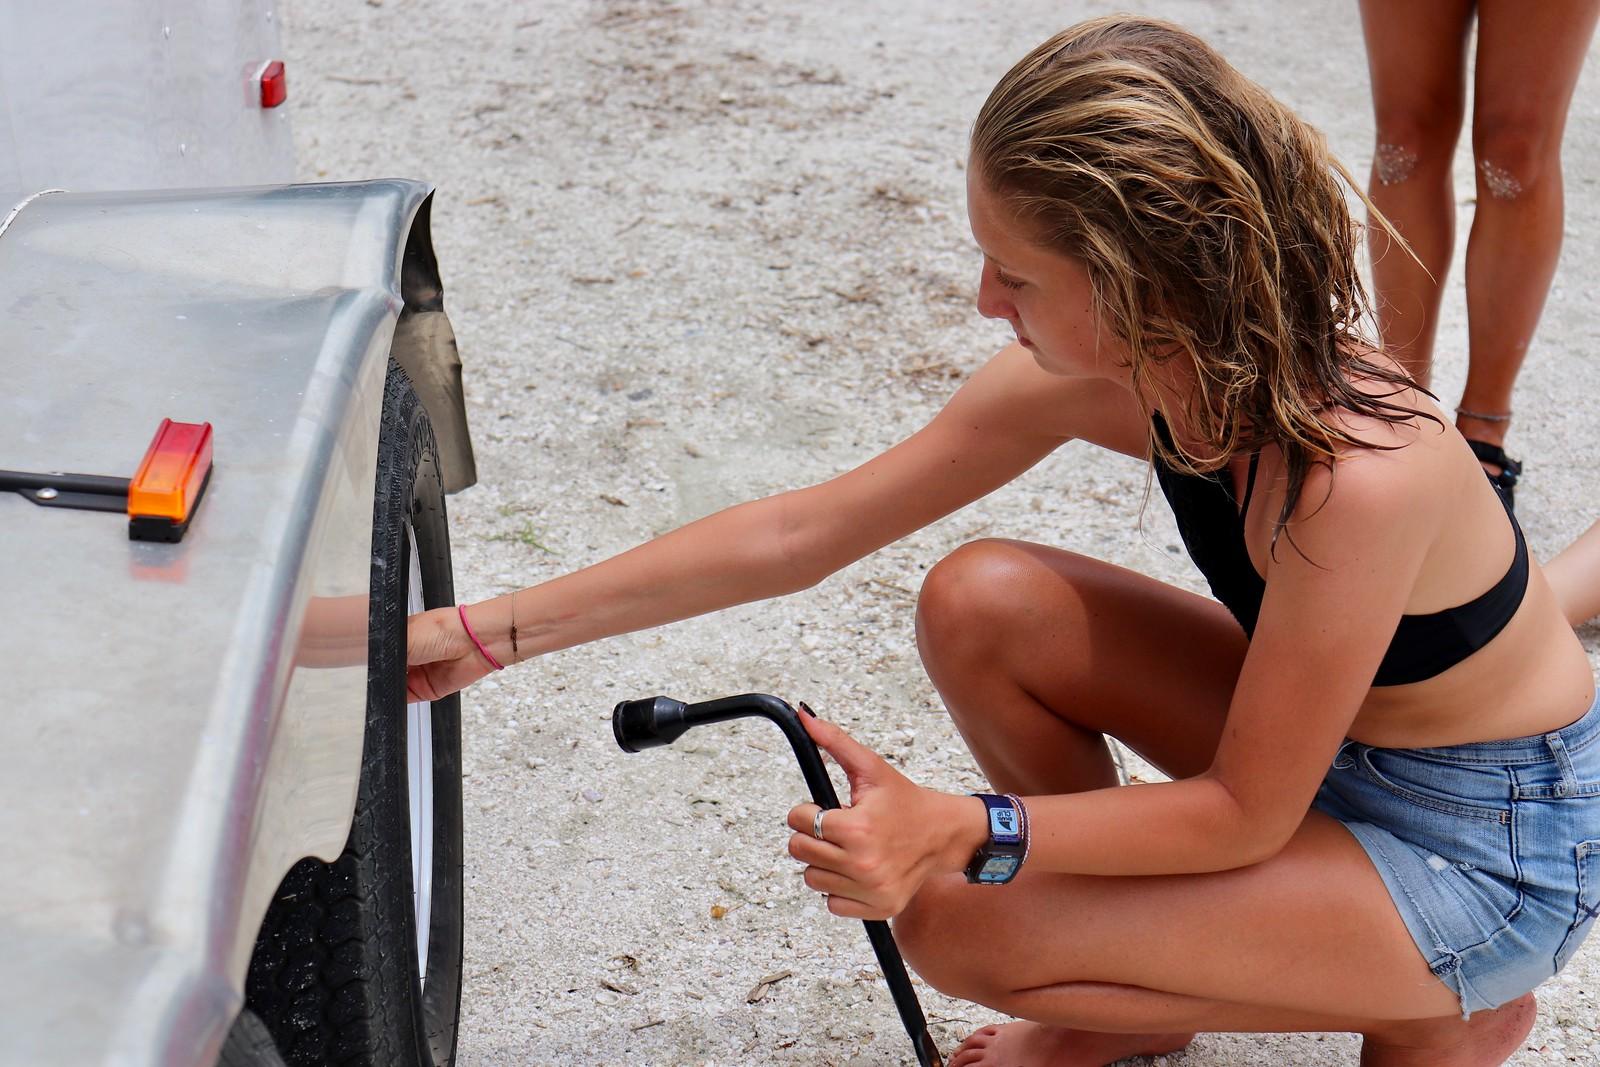 Beru Pierce practiced changing a tire.